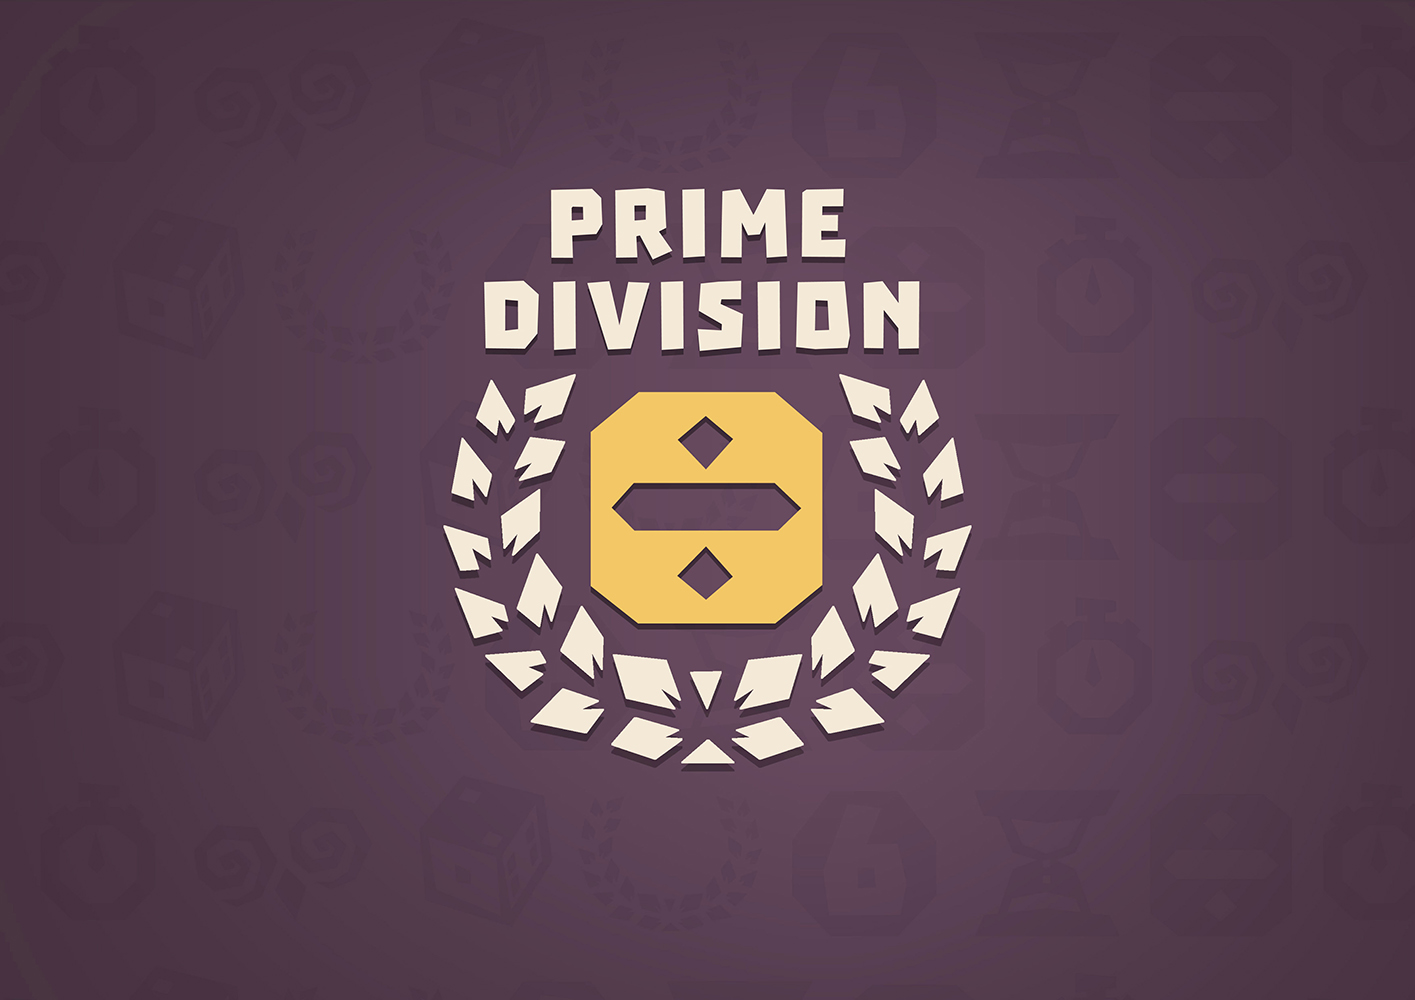 Prime Division A4man